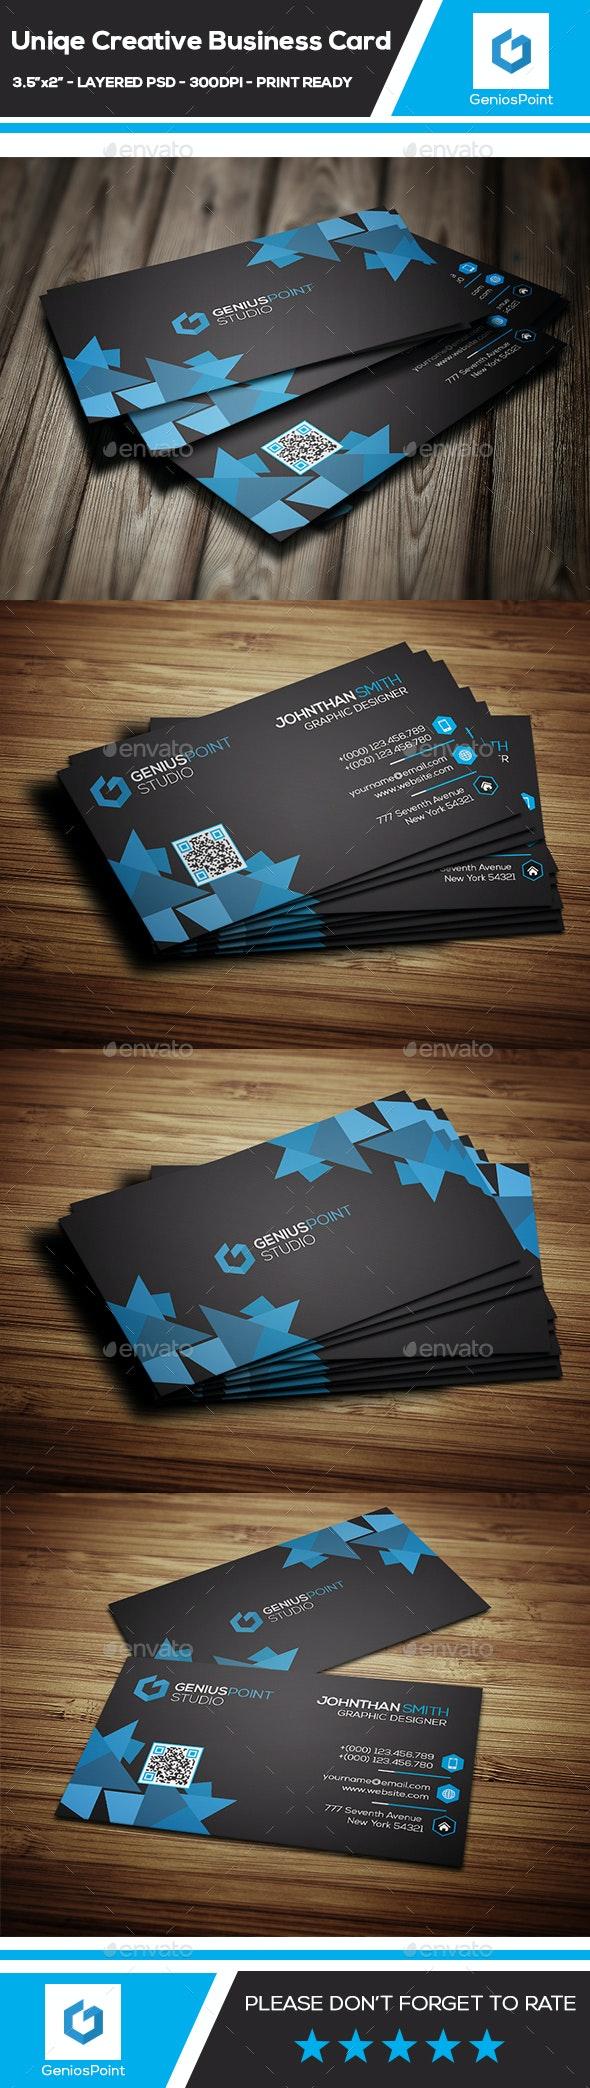 Unique Creative Business Card - Business Cards Print Templates